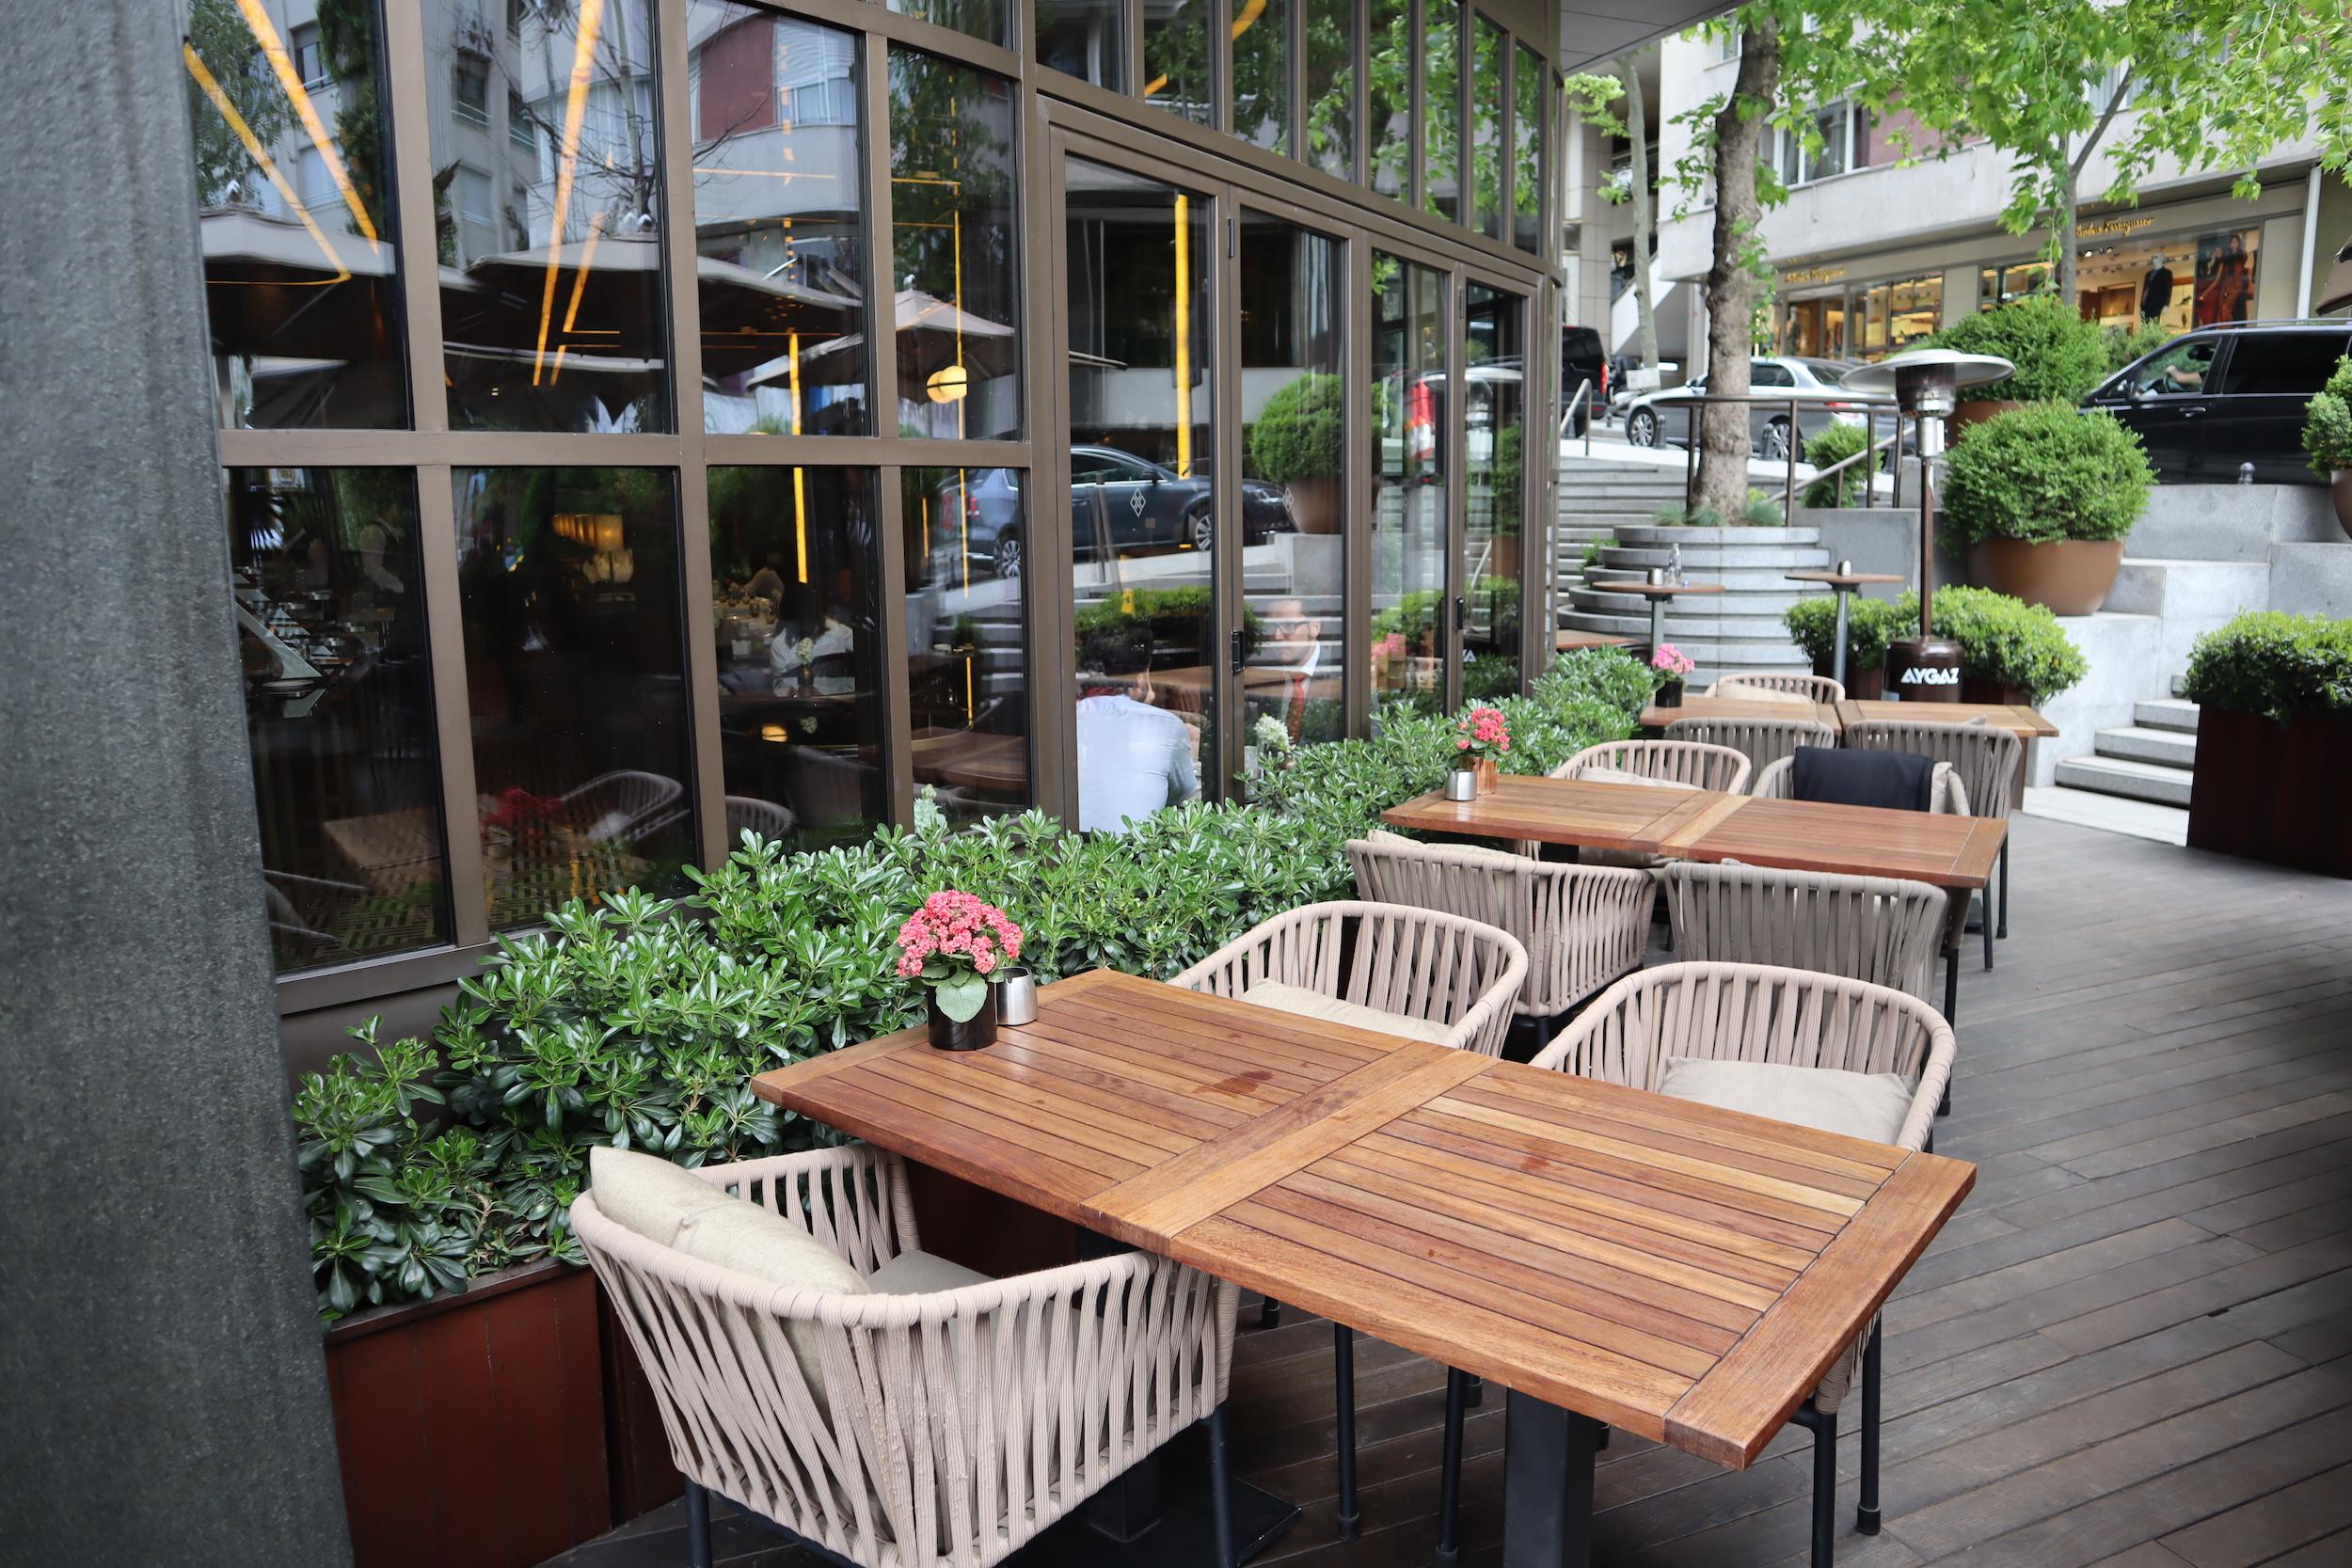 St. Regis Istanbul – St. Regis Brasserie outdoor patio